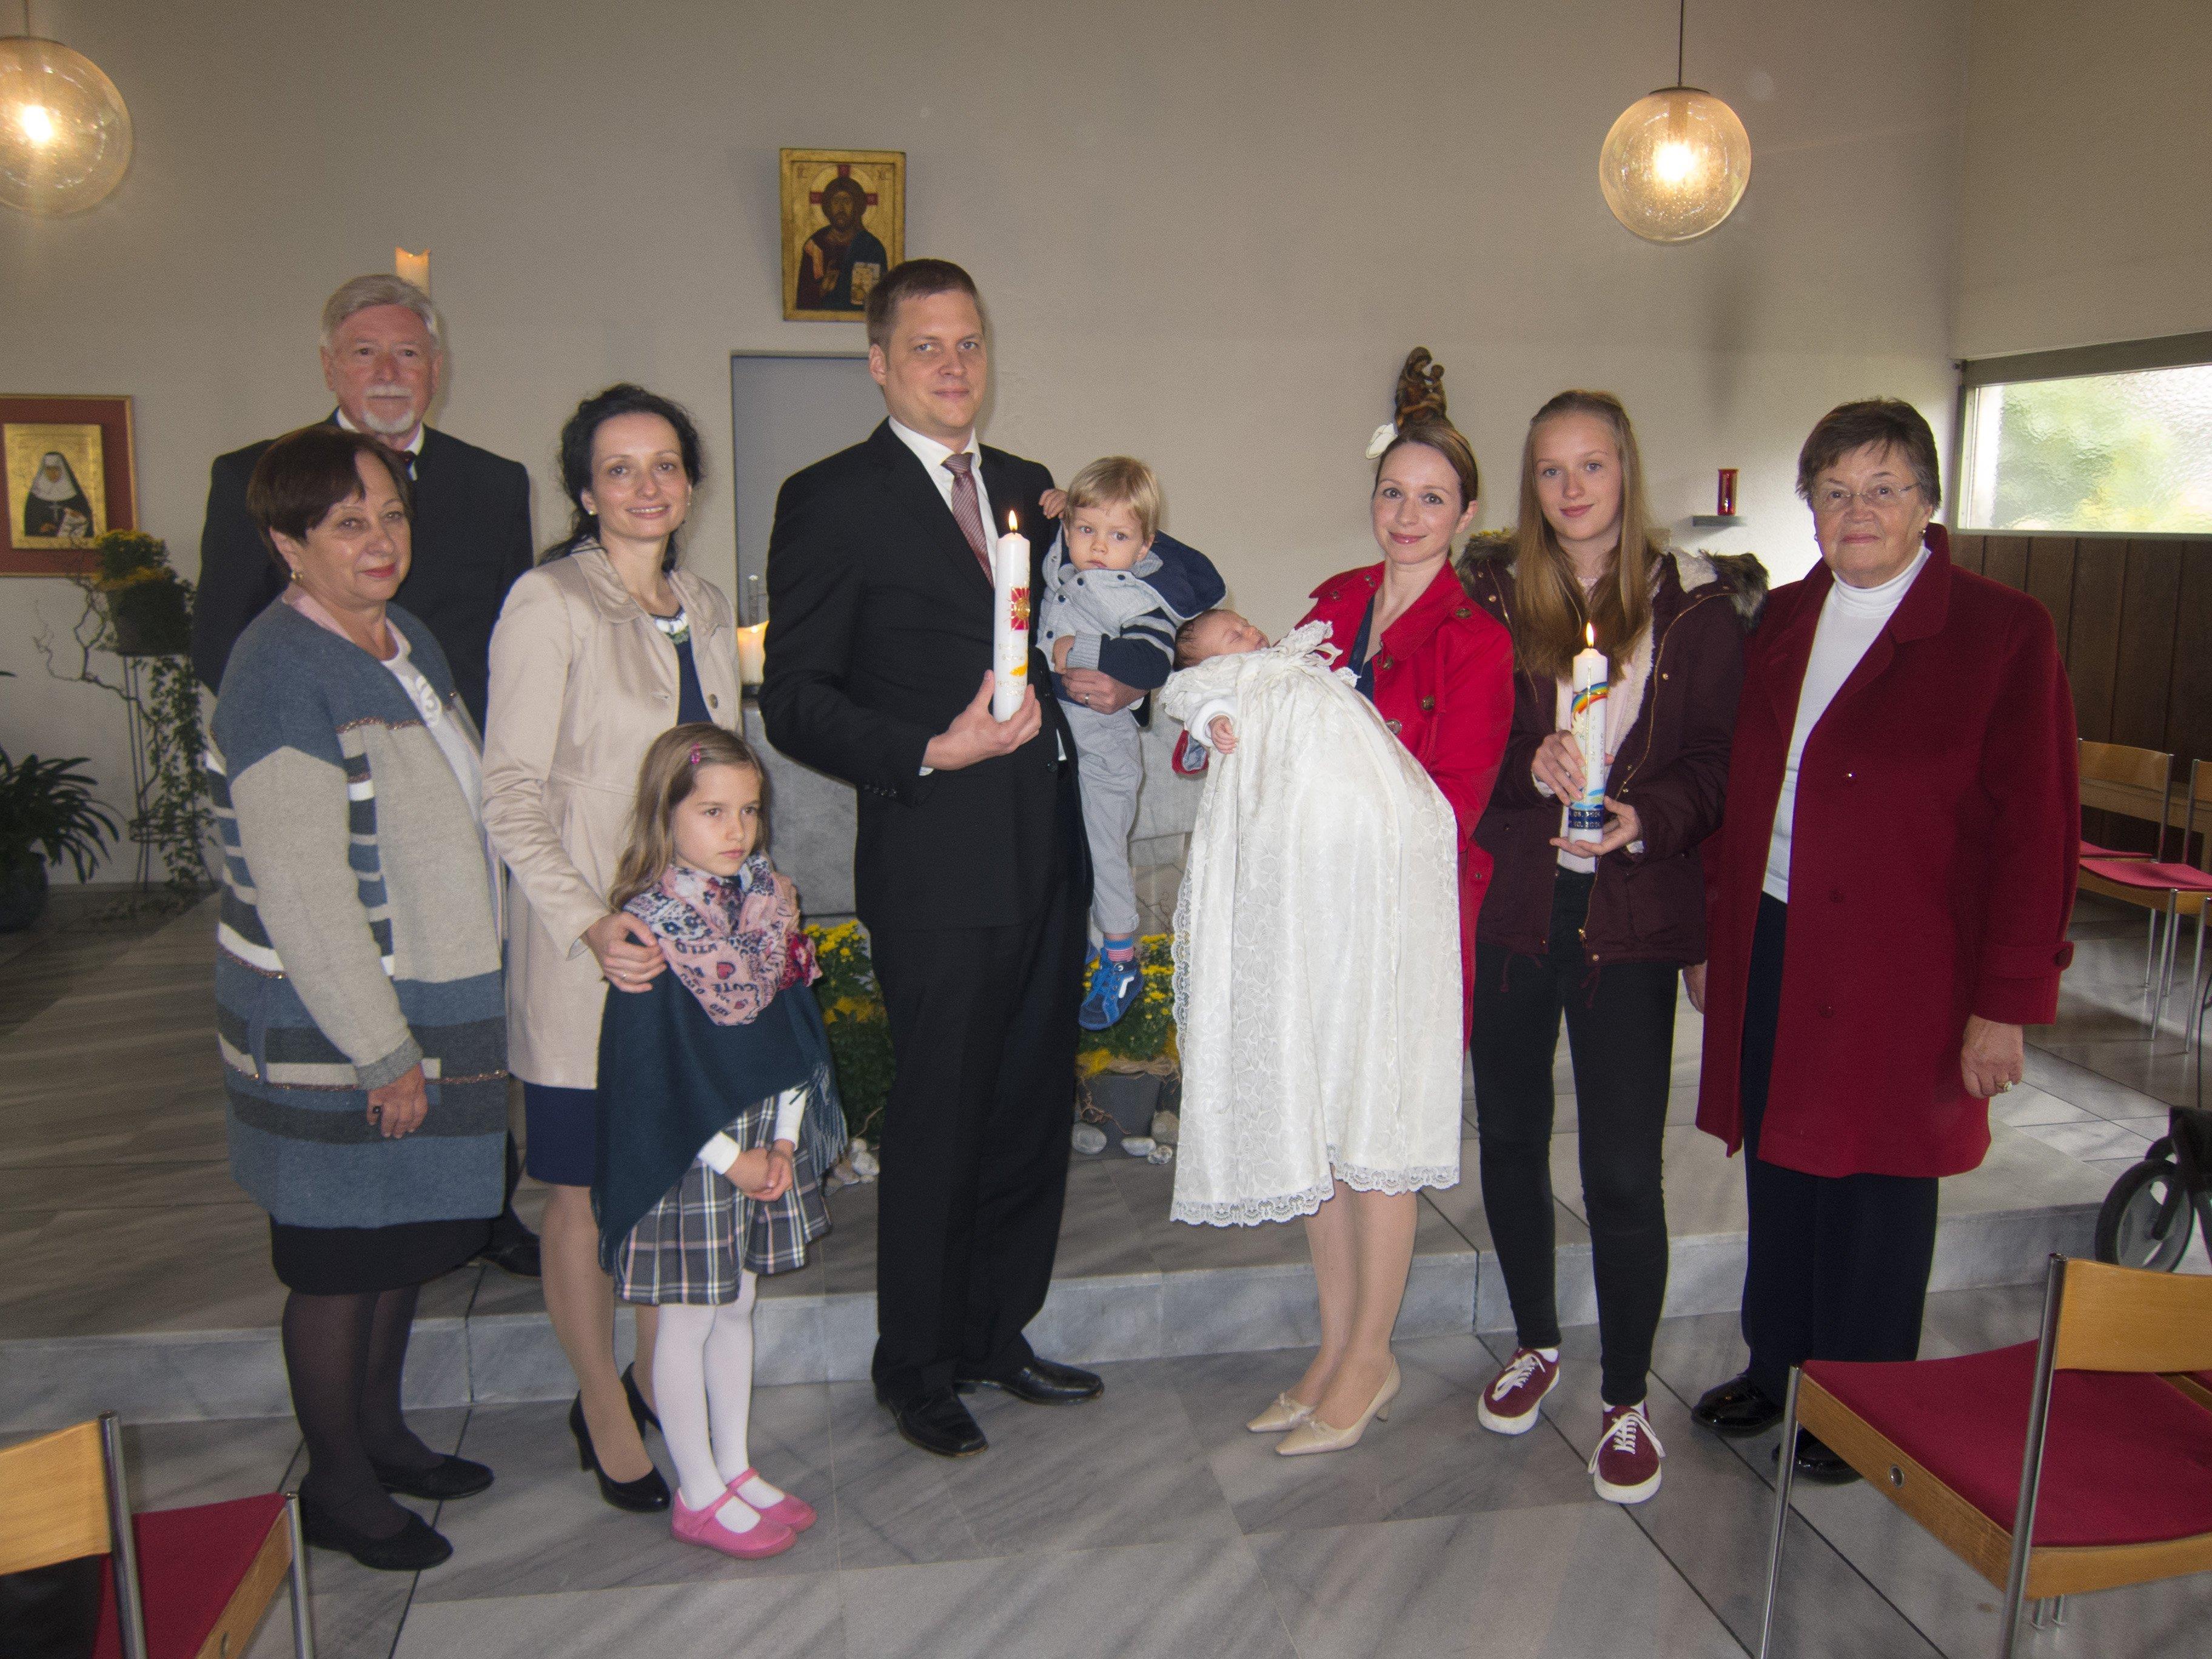 Taufe in der Katharine-Drexel-Kapelle